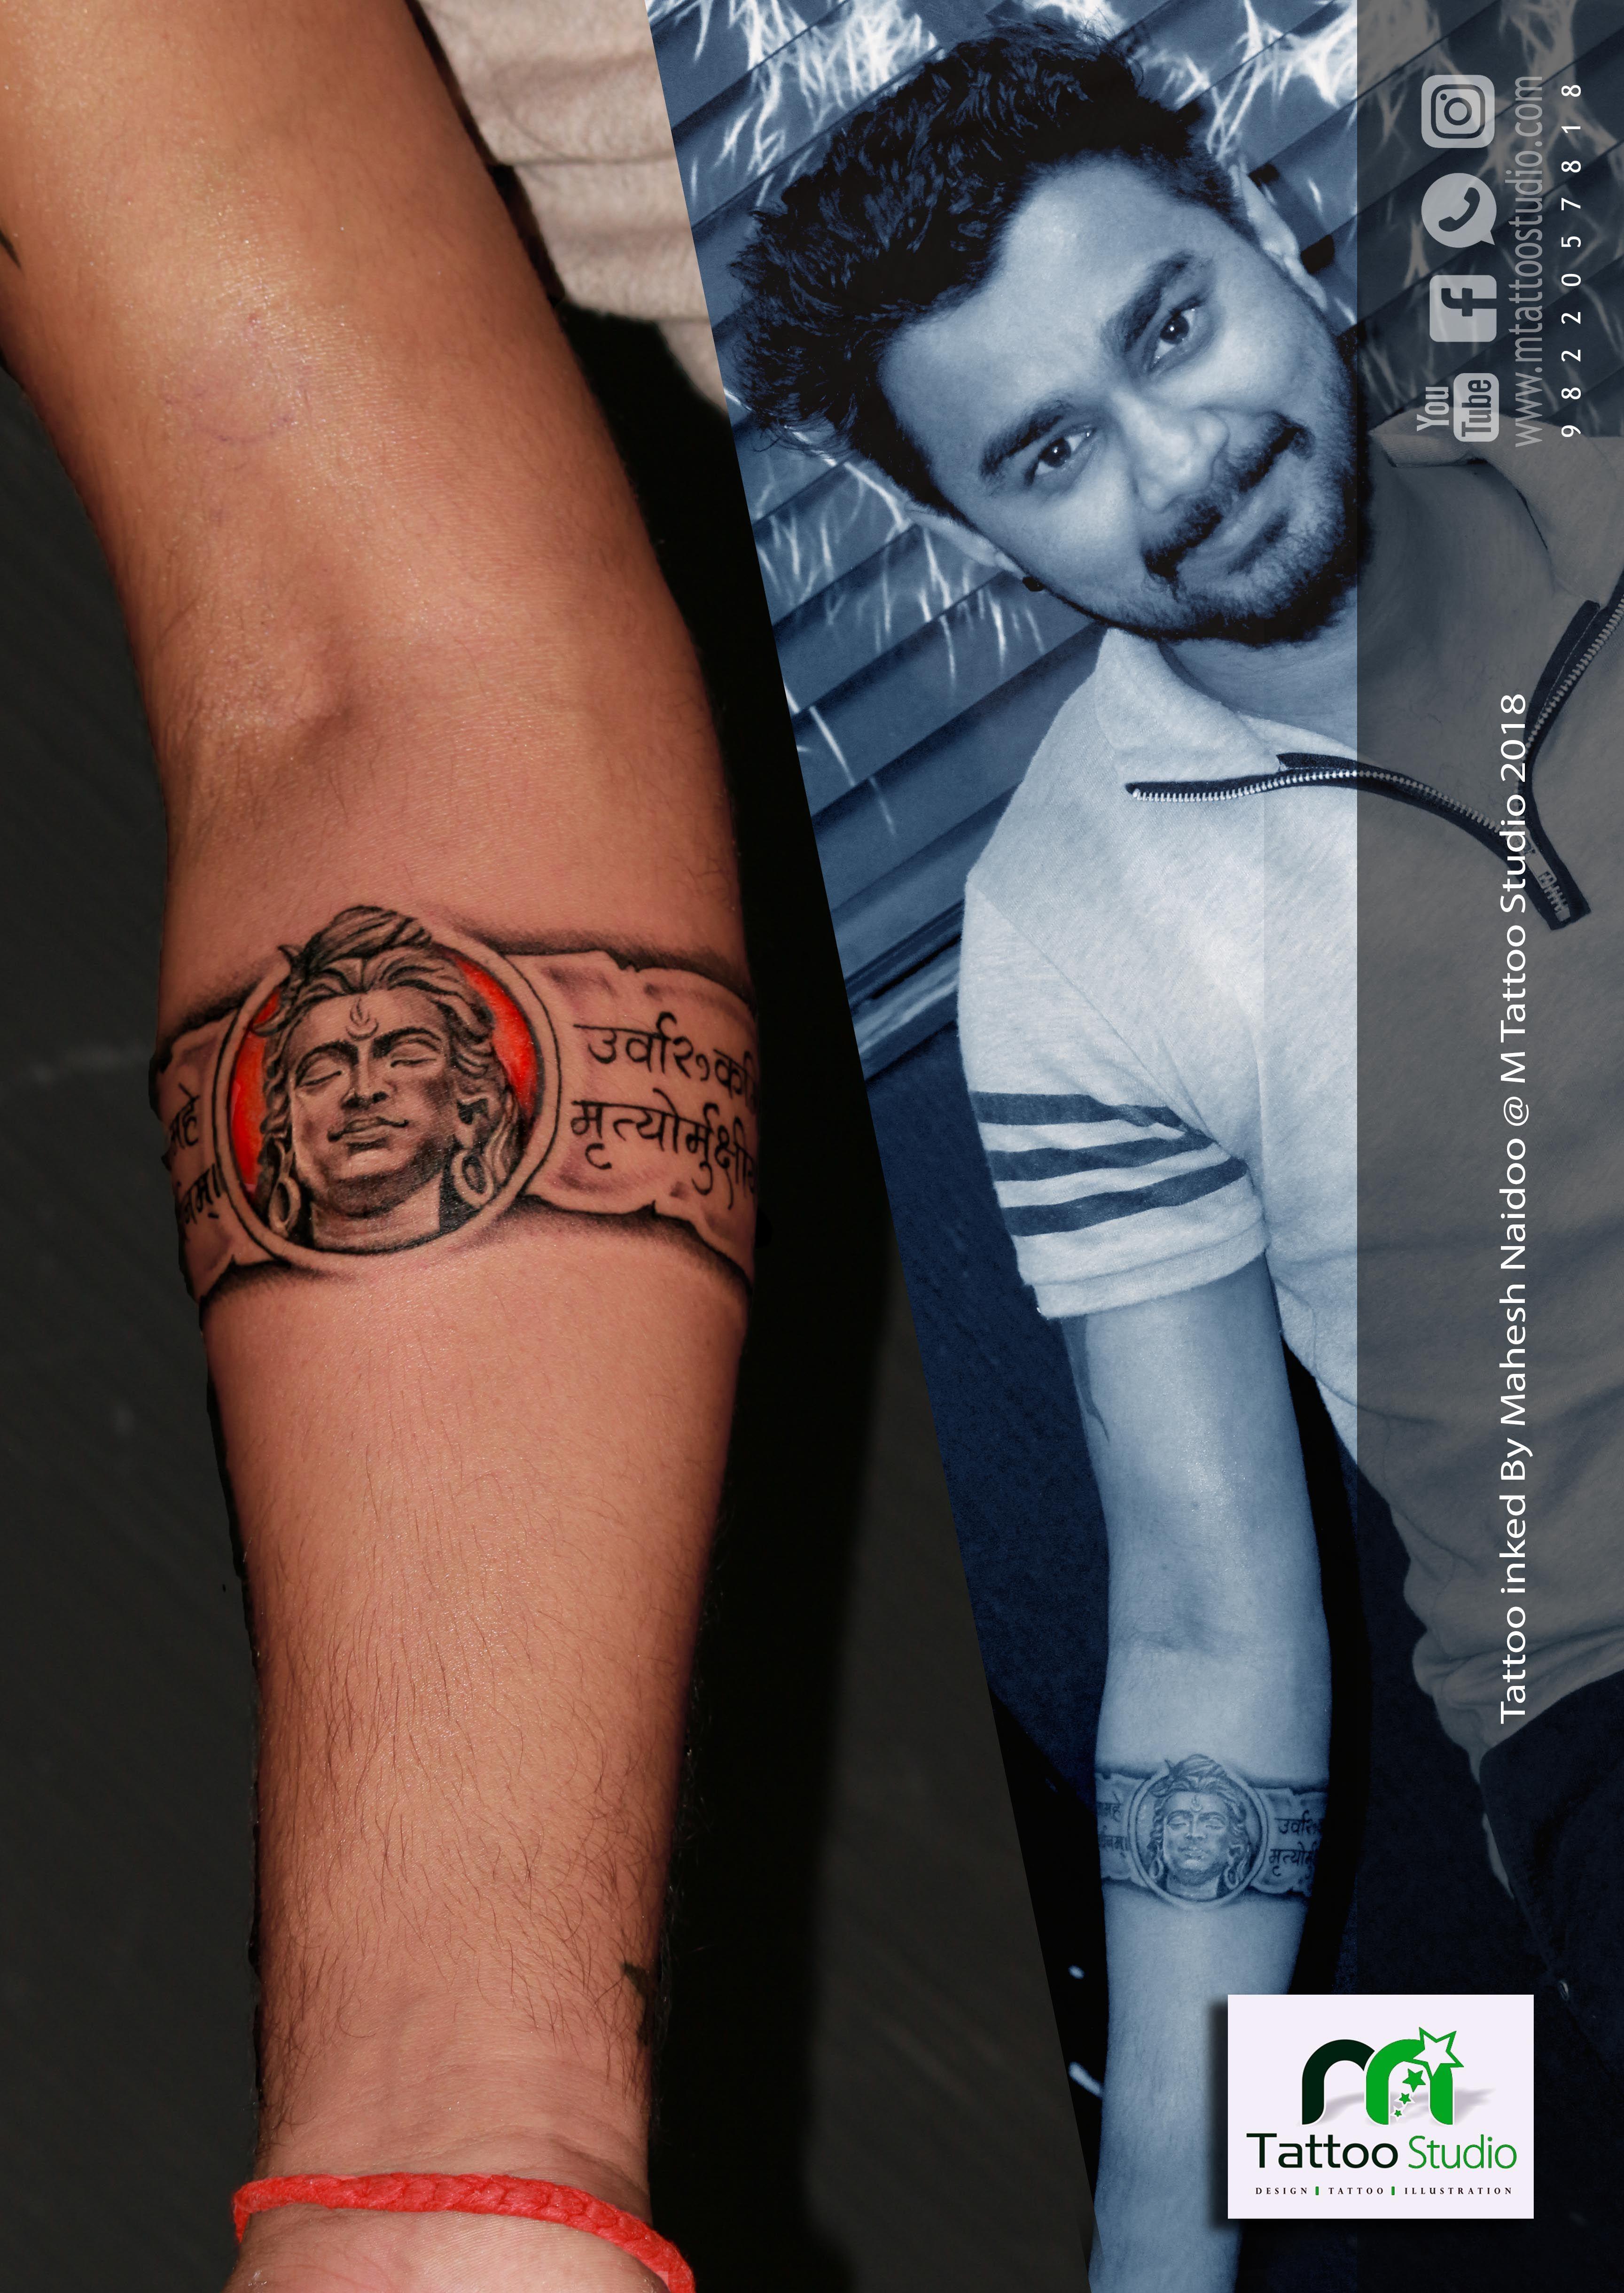 Lord Shiva Arm Band Tattoo Design Inked By Mahesh Naidoo Band Tattoo Designs Forearm Band Tattoos Wrist Band Tattoo